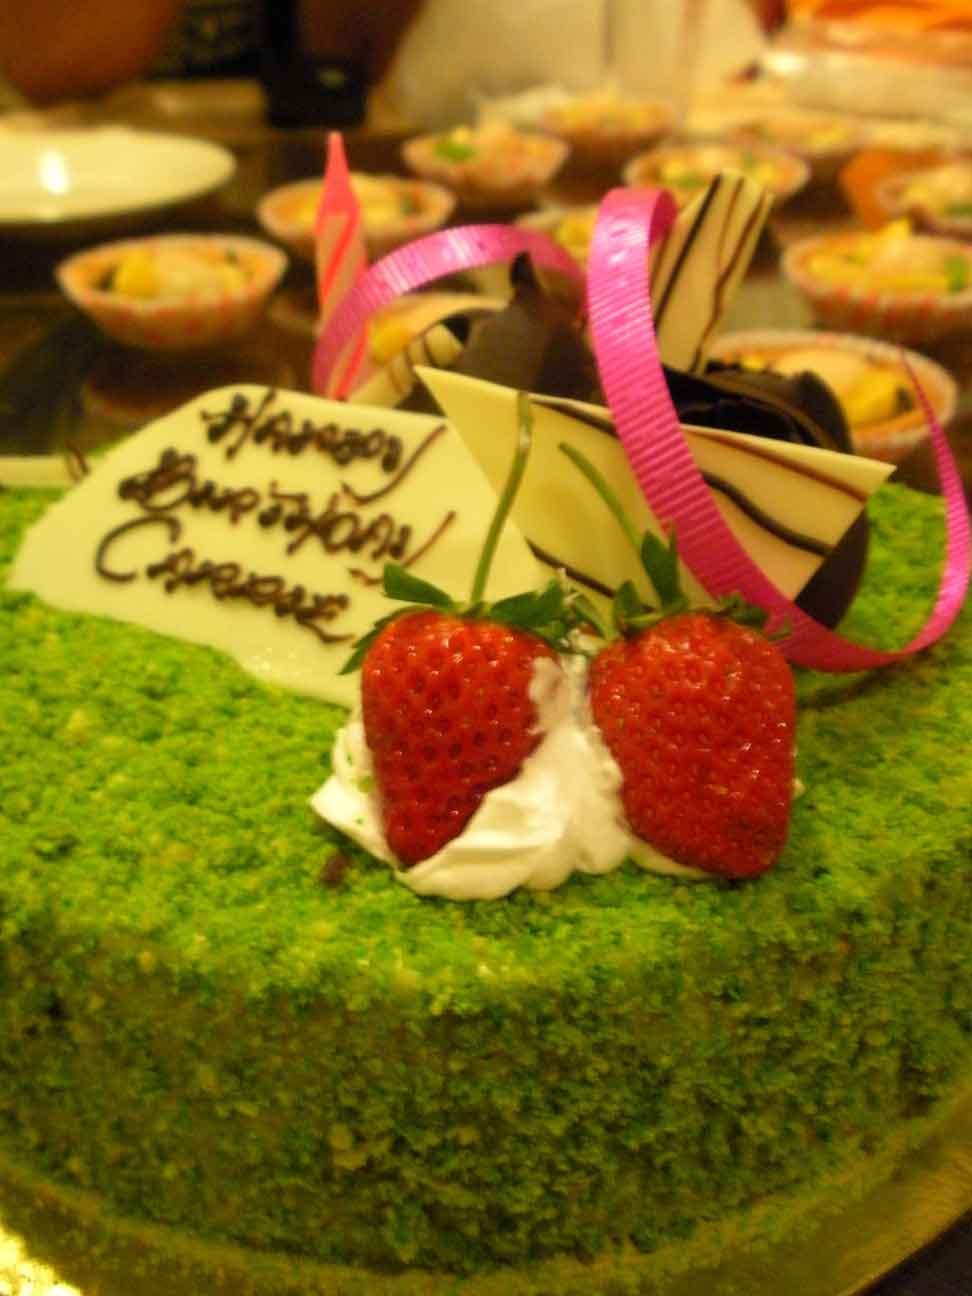 Cariso's cake